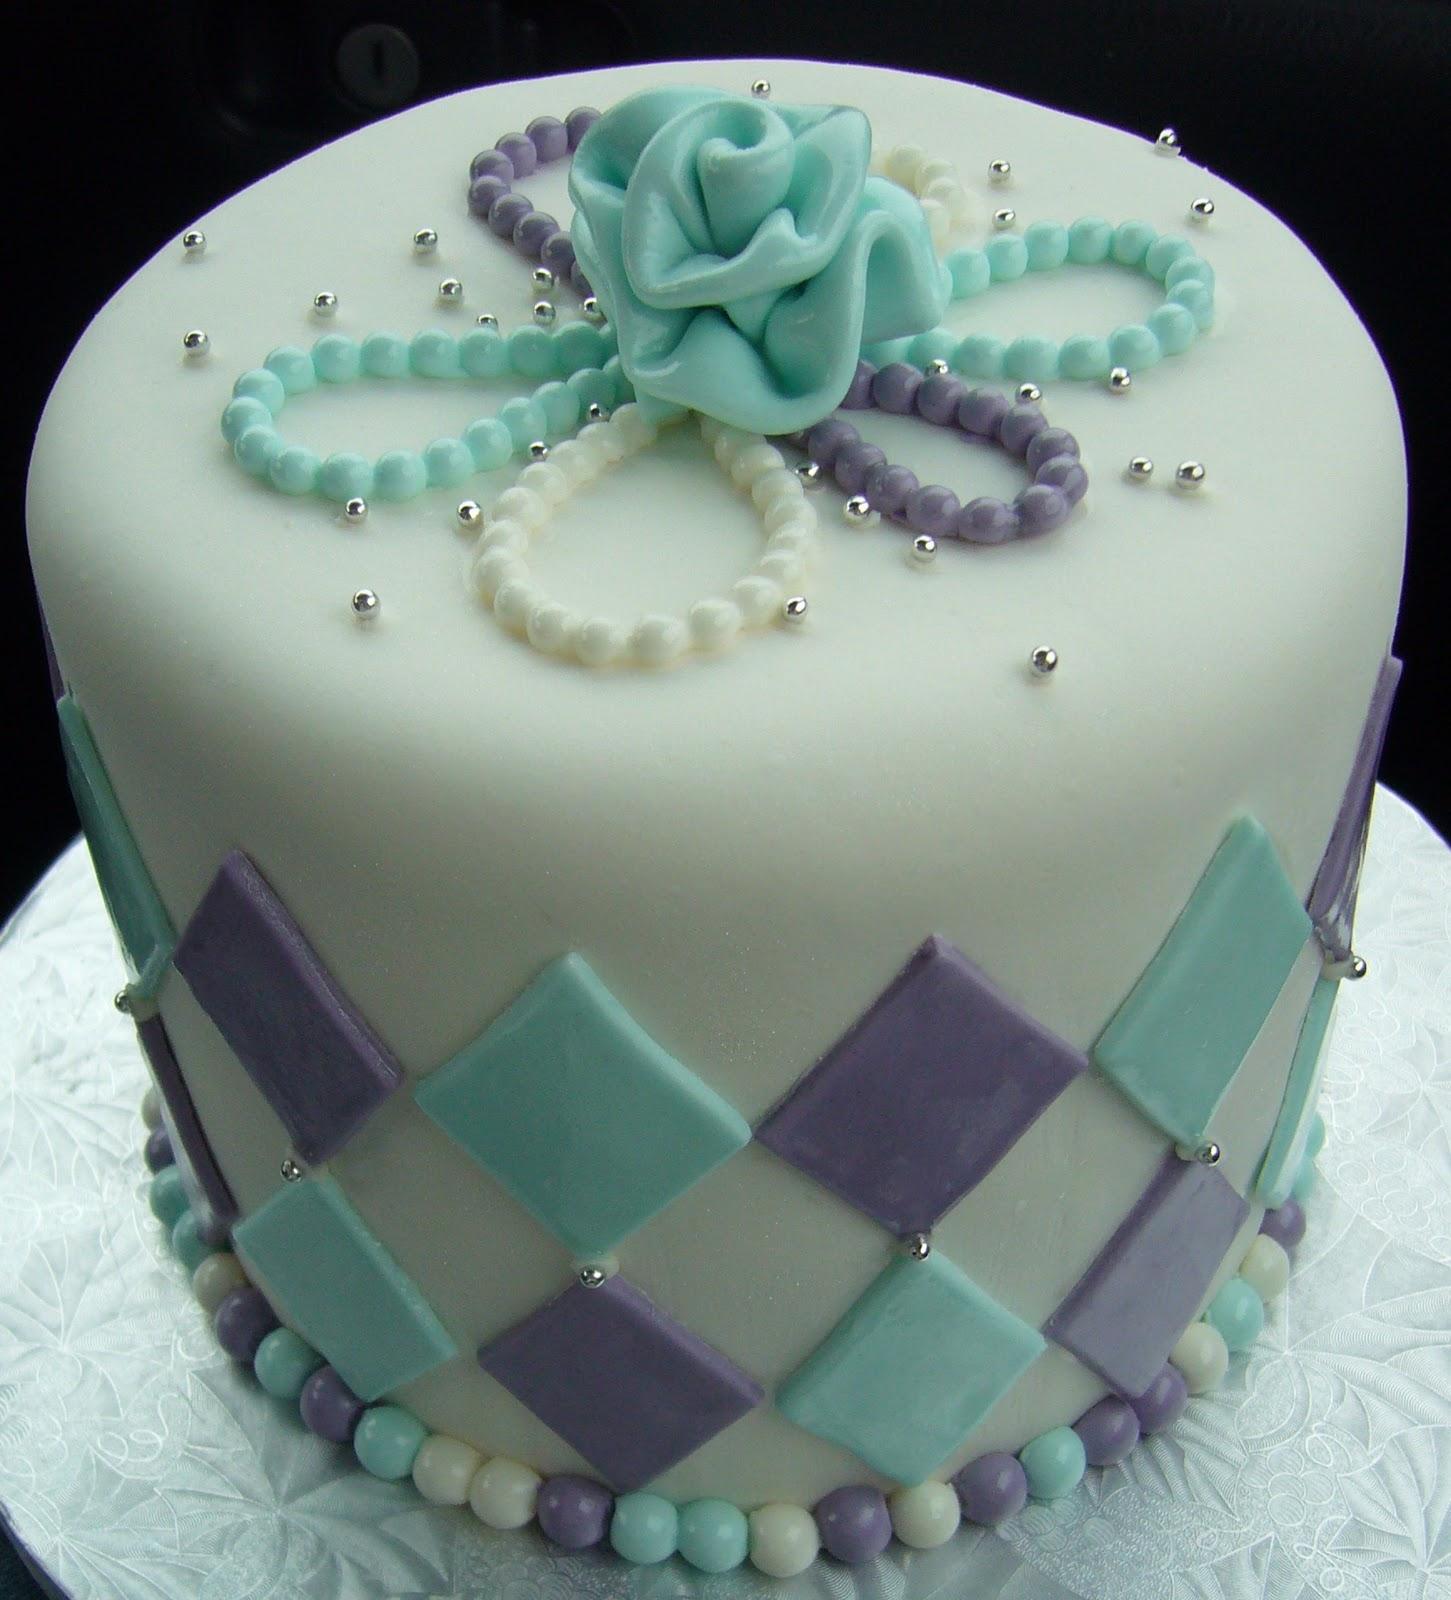 Elly S Studio Cake Design Chilliwack : Elly s Cakes: Favorites